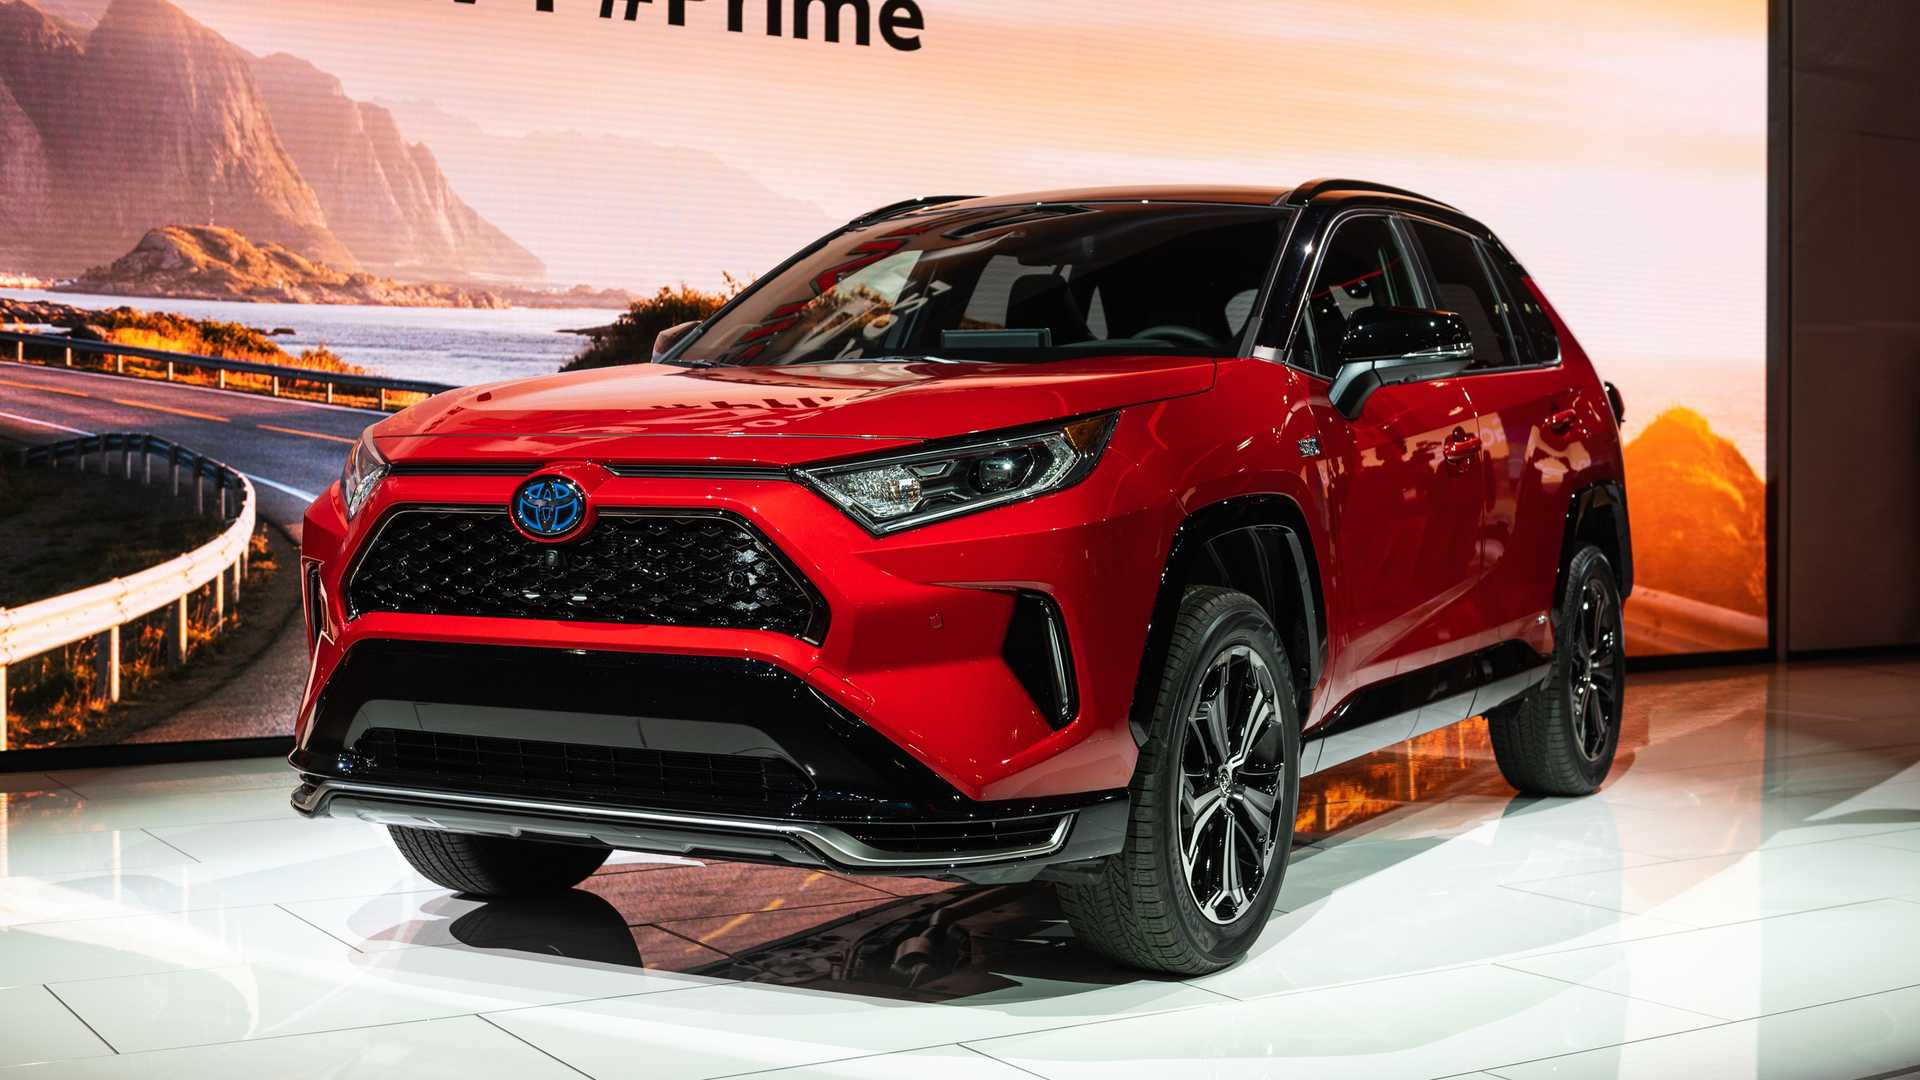 2021 Toyota Rav4 Prime Price Announced Starts At 38 100